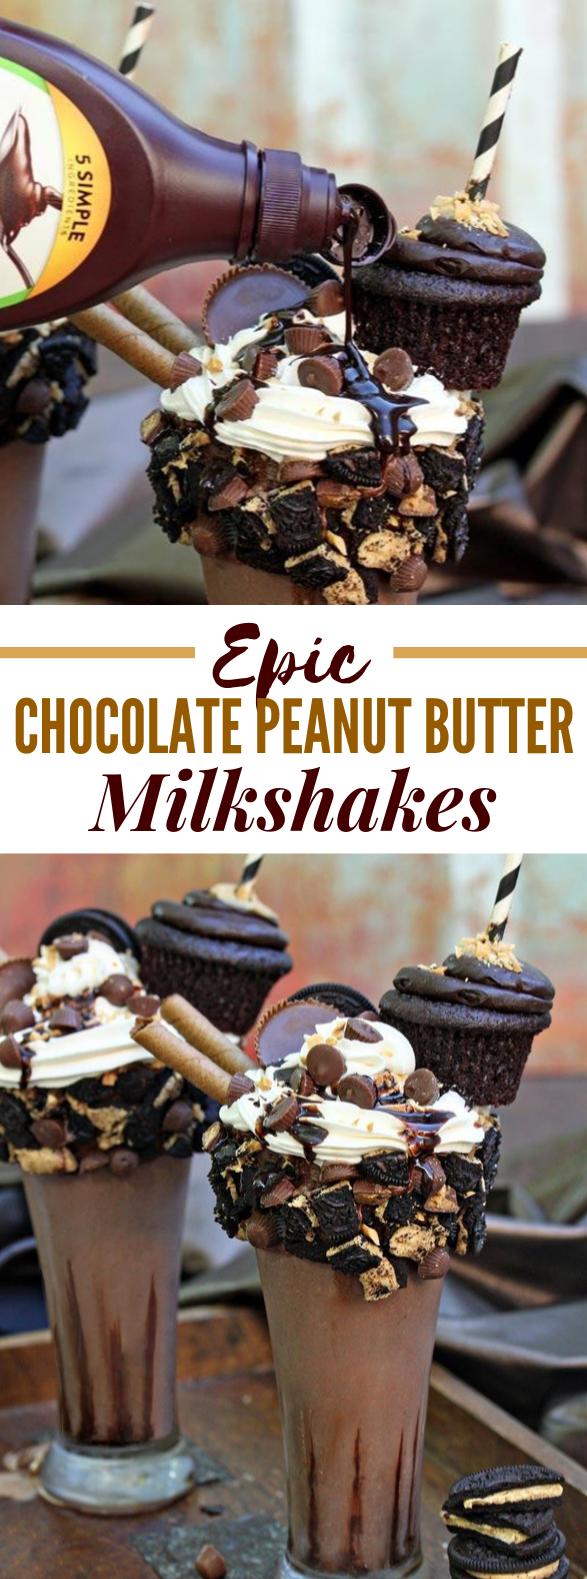 EPIC CHOCOLATE PEANUT BUTTER MILKSHAKES #drinks #smoothies